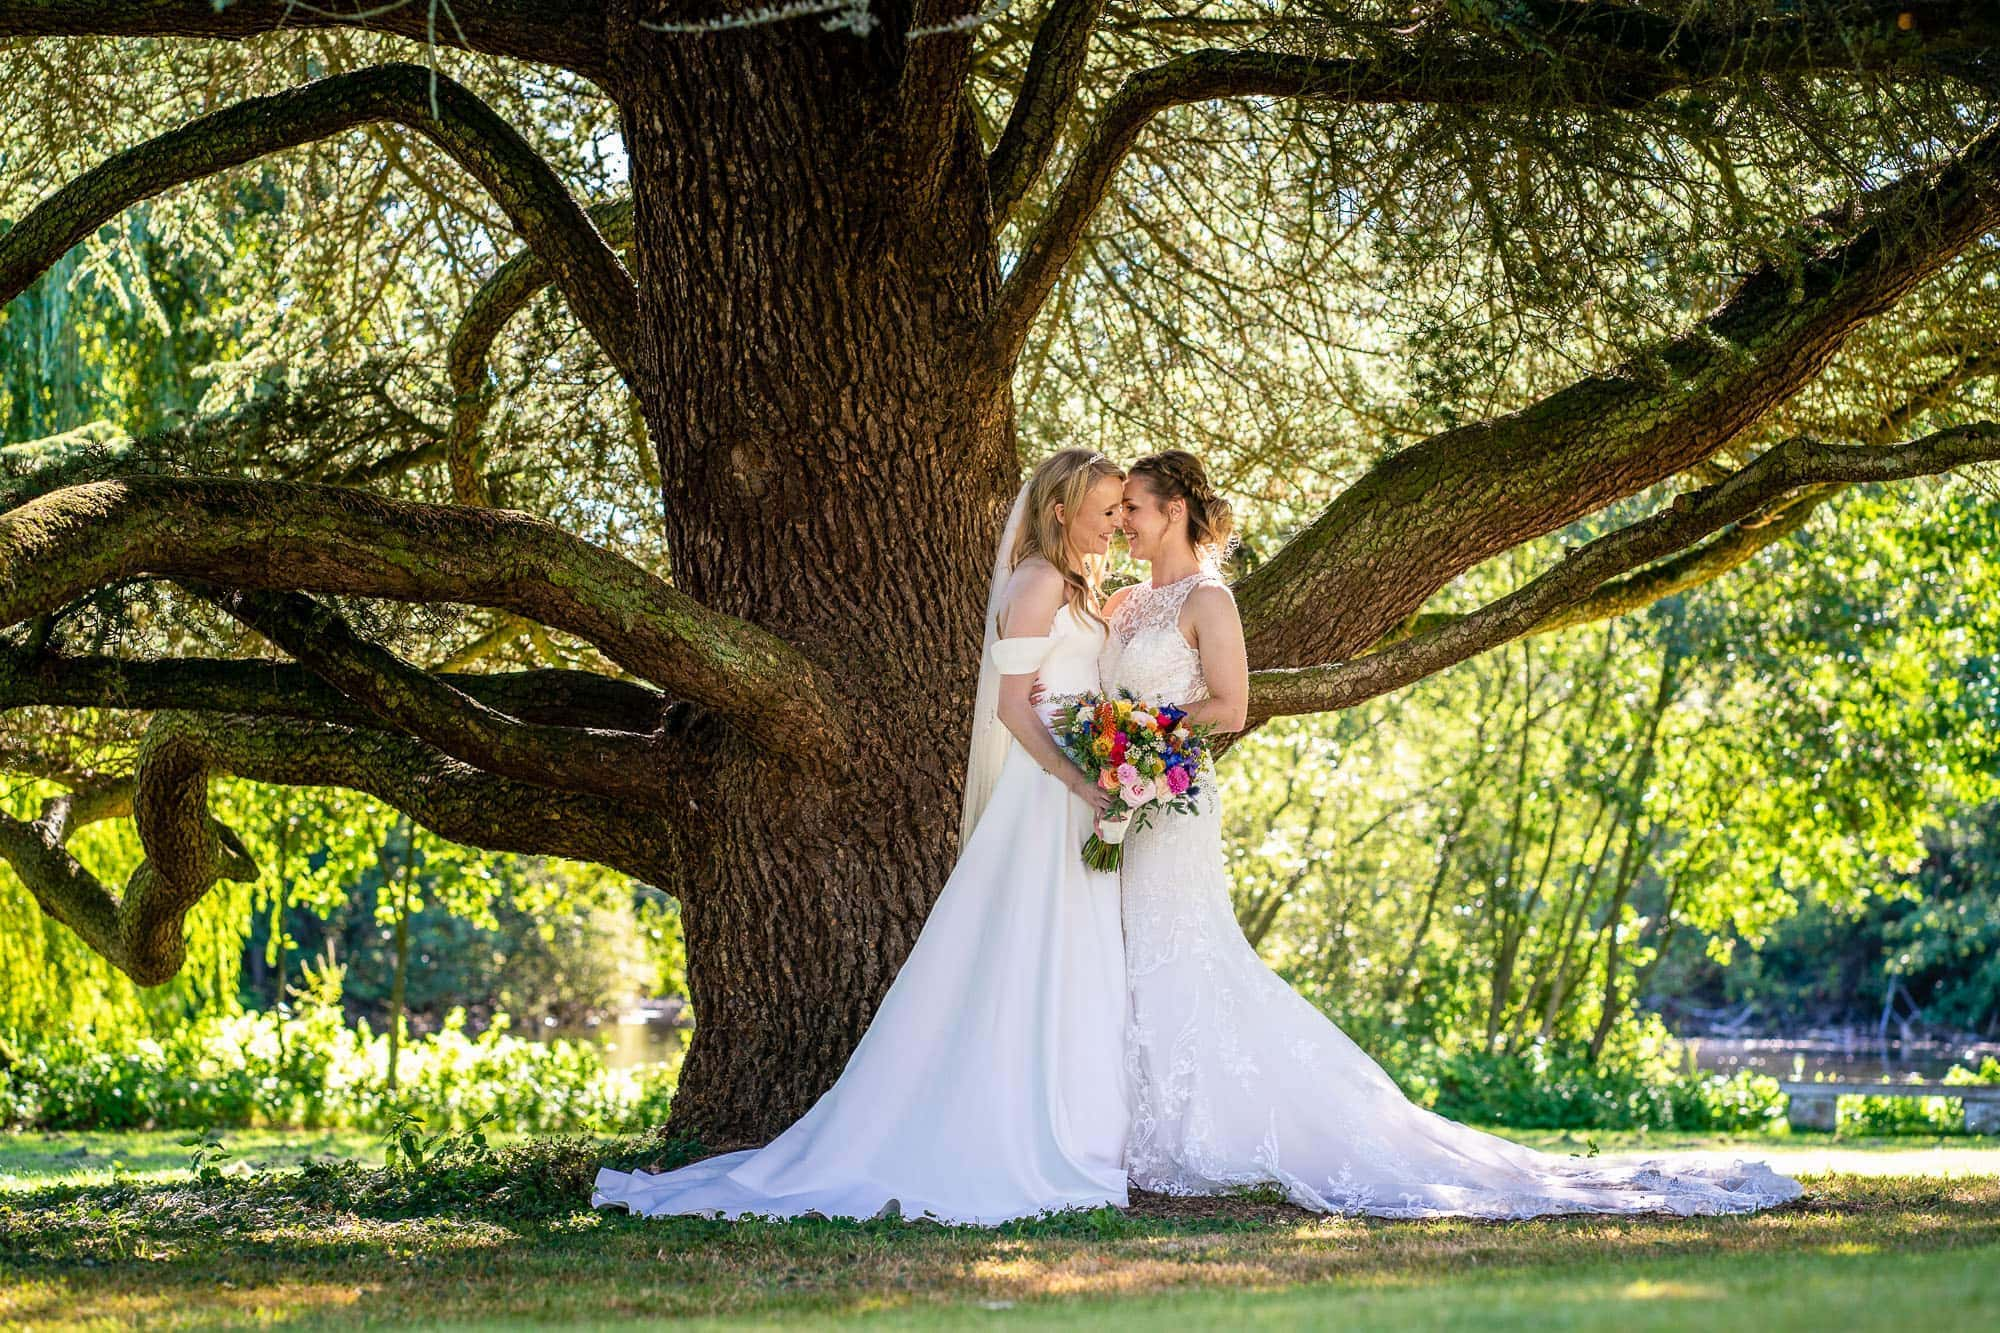 Two Brides Wedding Portrait - Norton Park wedding photography